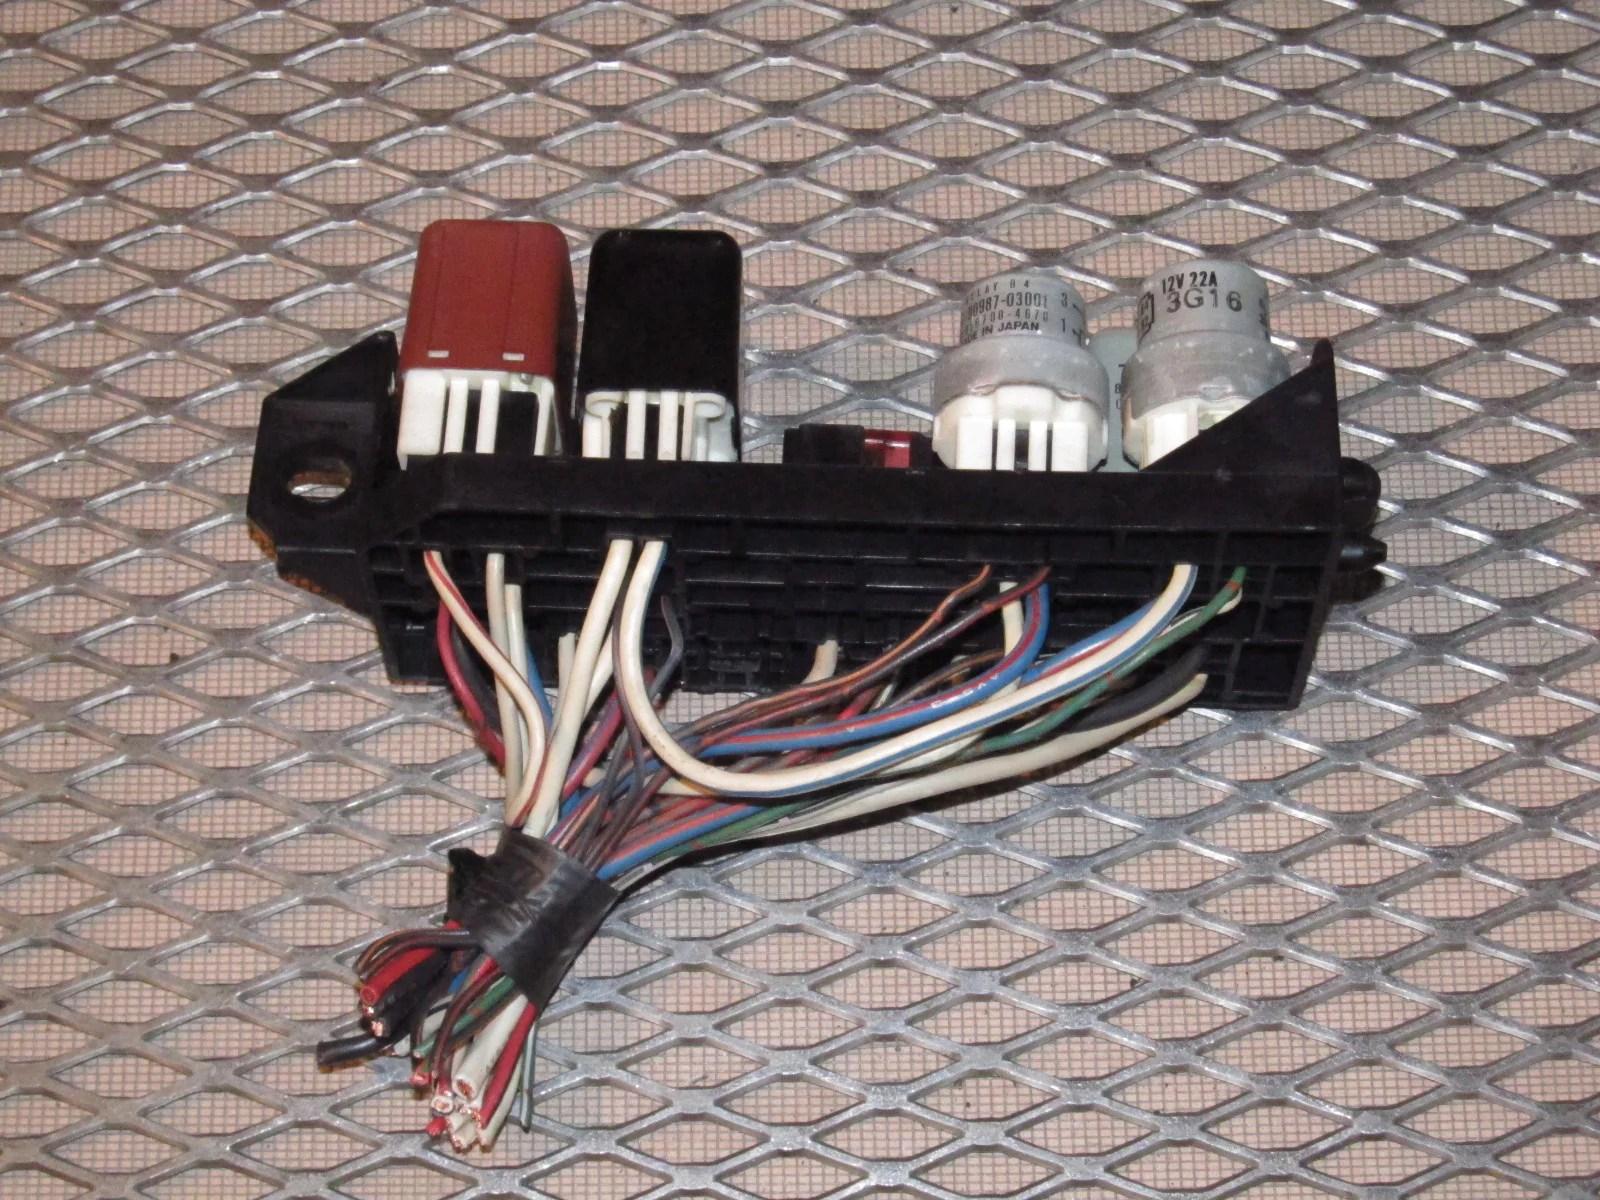 87 88 89 toyota mr2 oem interior front hood fuse box  [ 1600 x 1200 Pixel ]